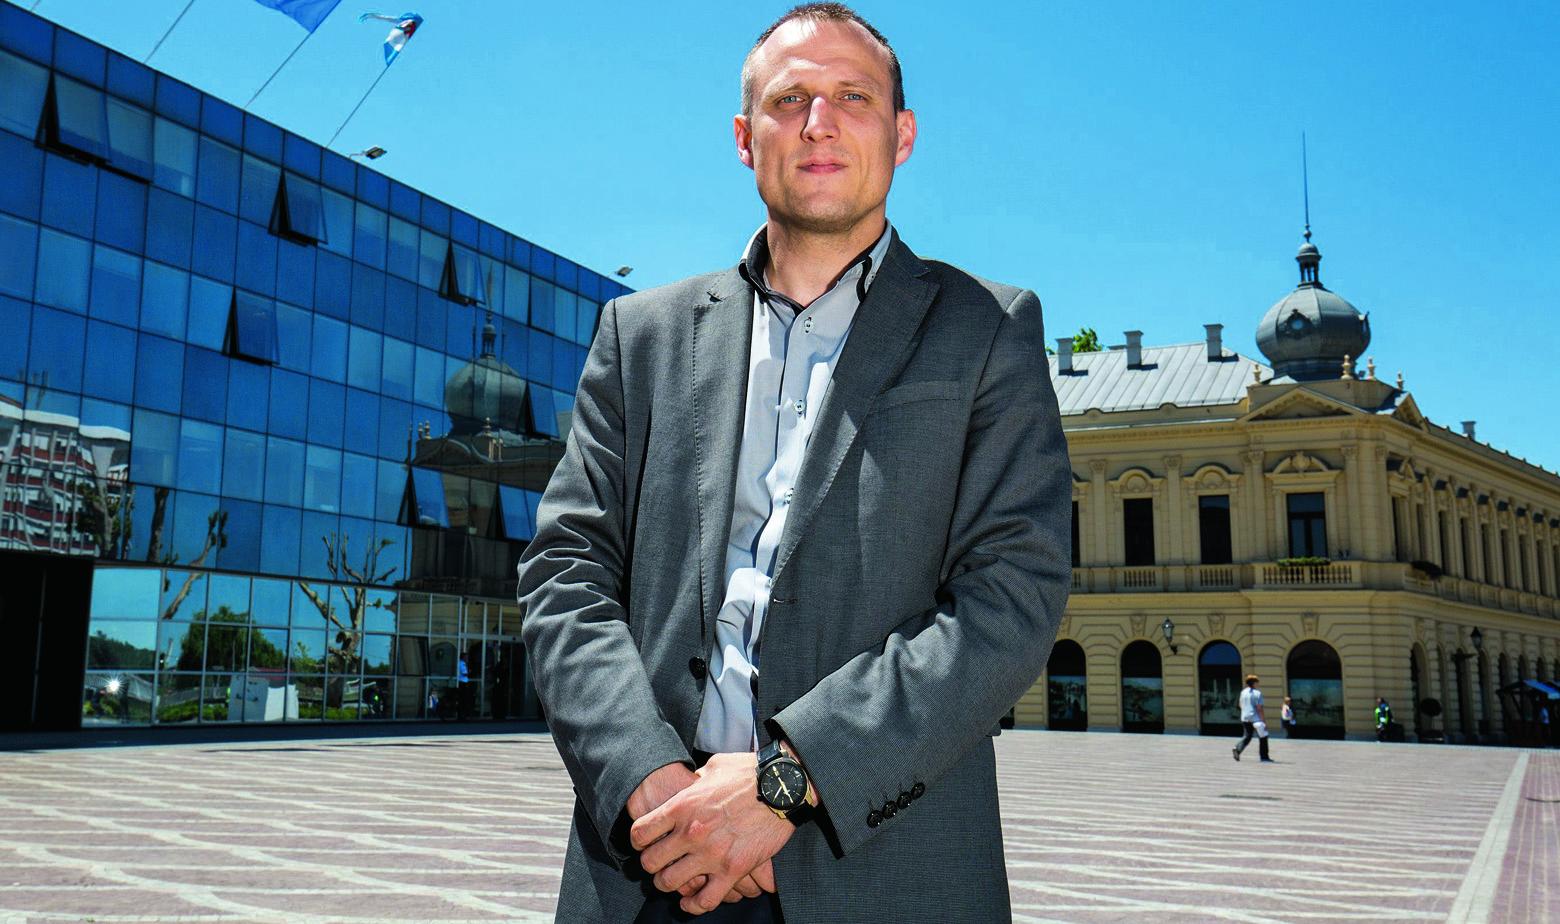 Srđan Milaković